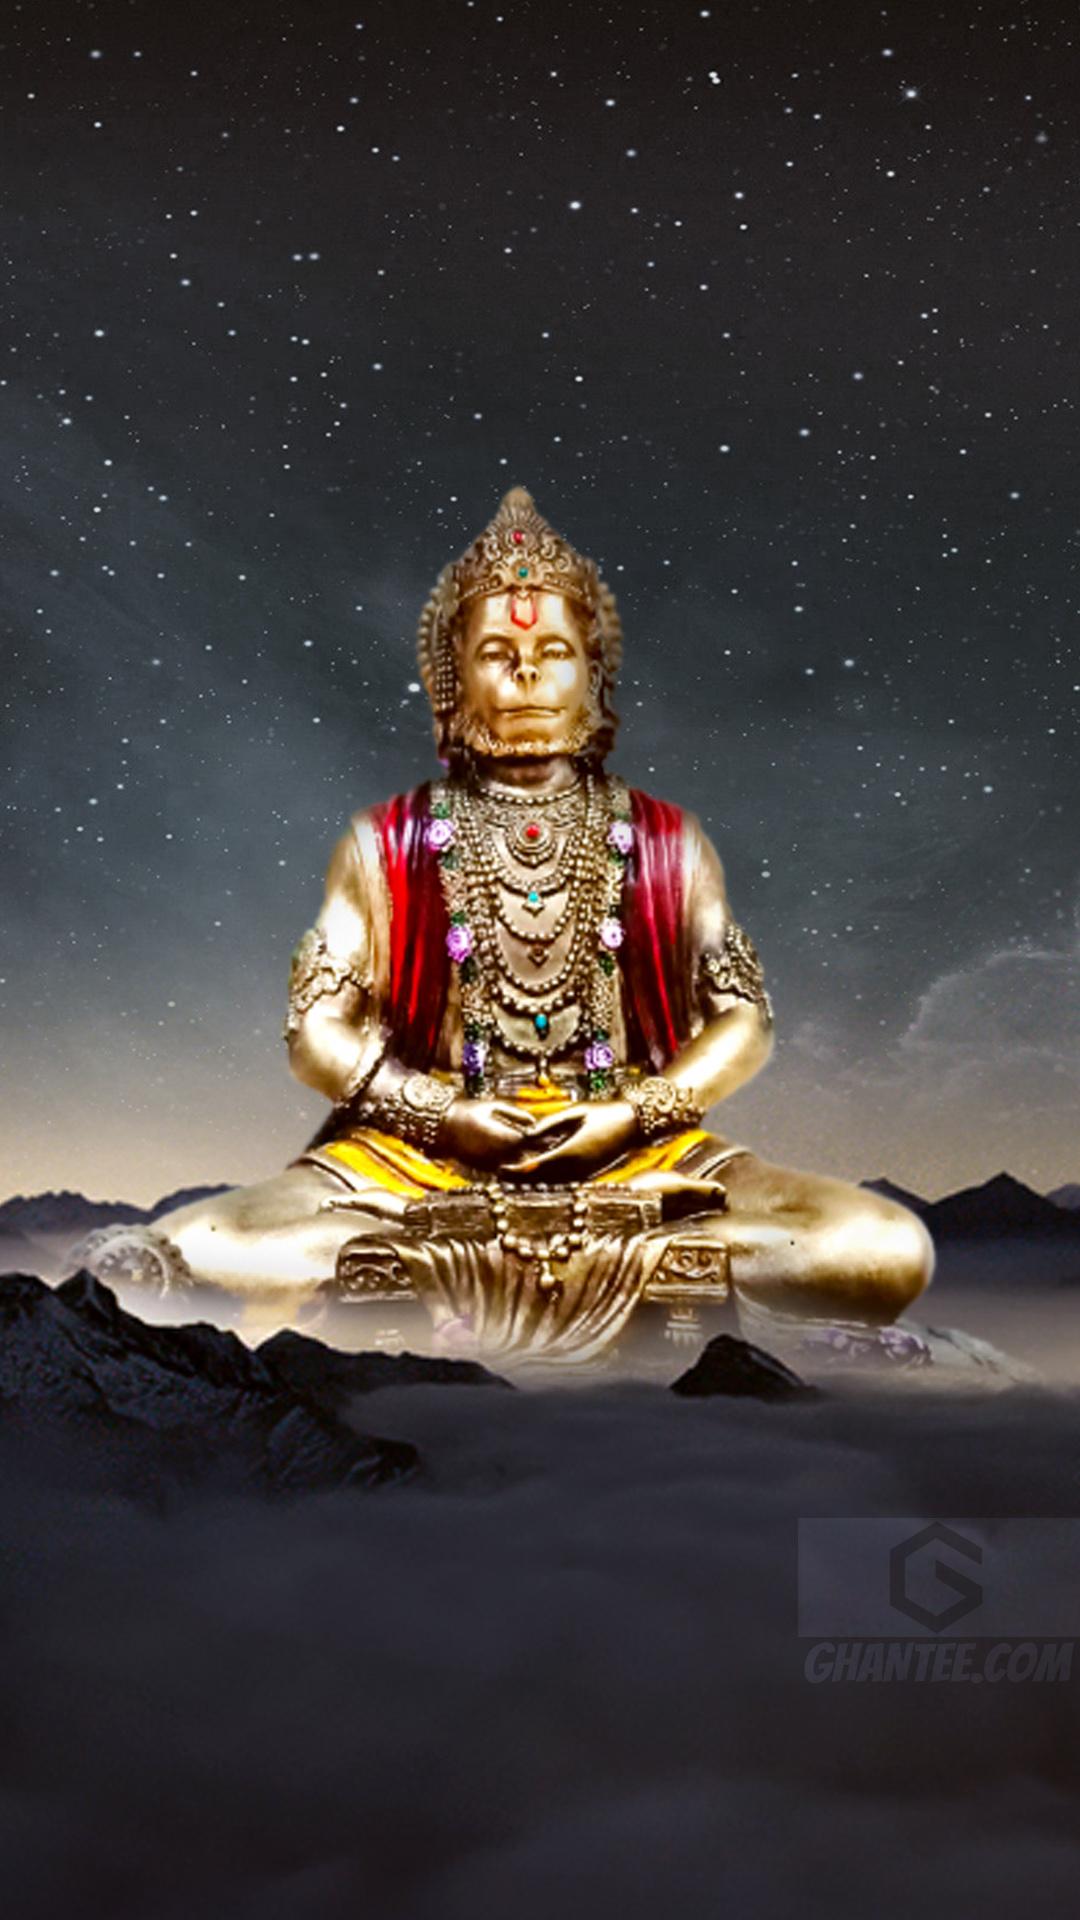 lord hanuman hd image for mobile